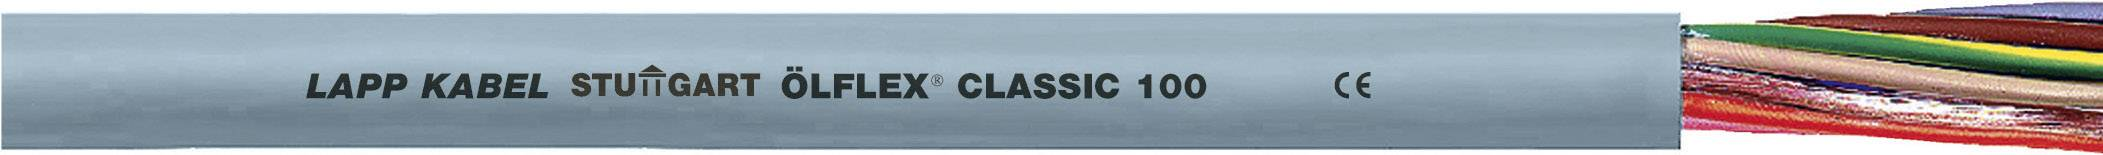 Kabel LappKabel Ölflex CLASSIC 100 5G2,5 (00100893), PVC, 11,8 mm, 750 V, šedá, 50 m